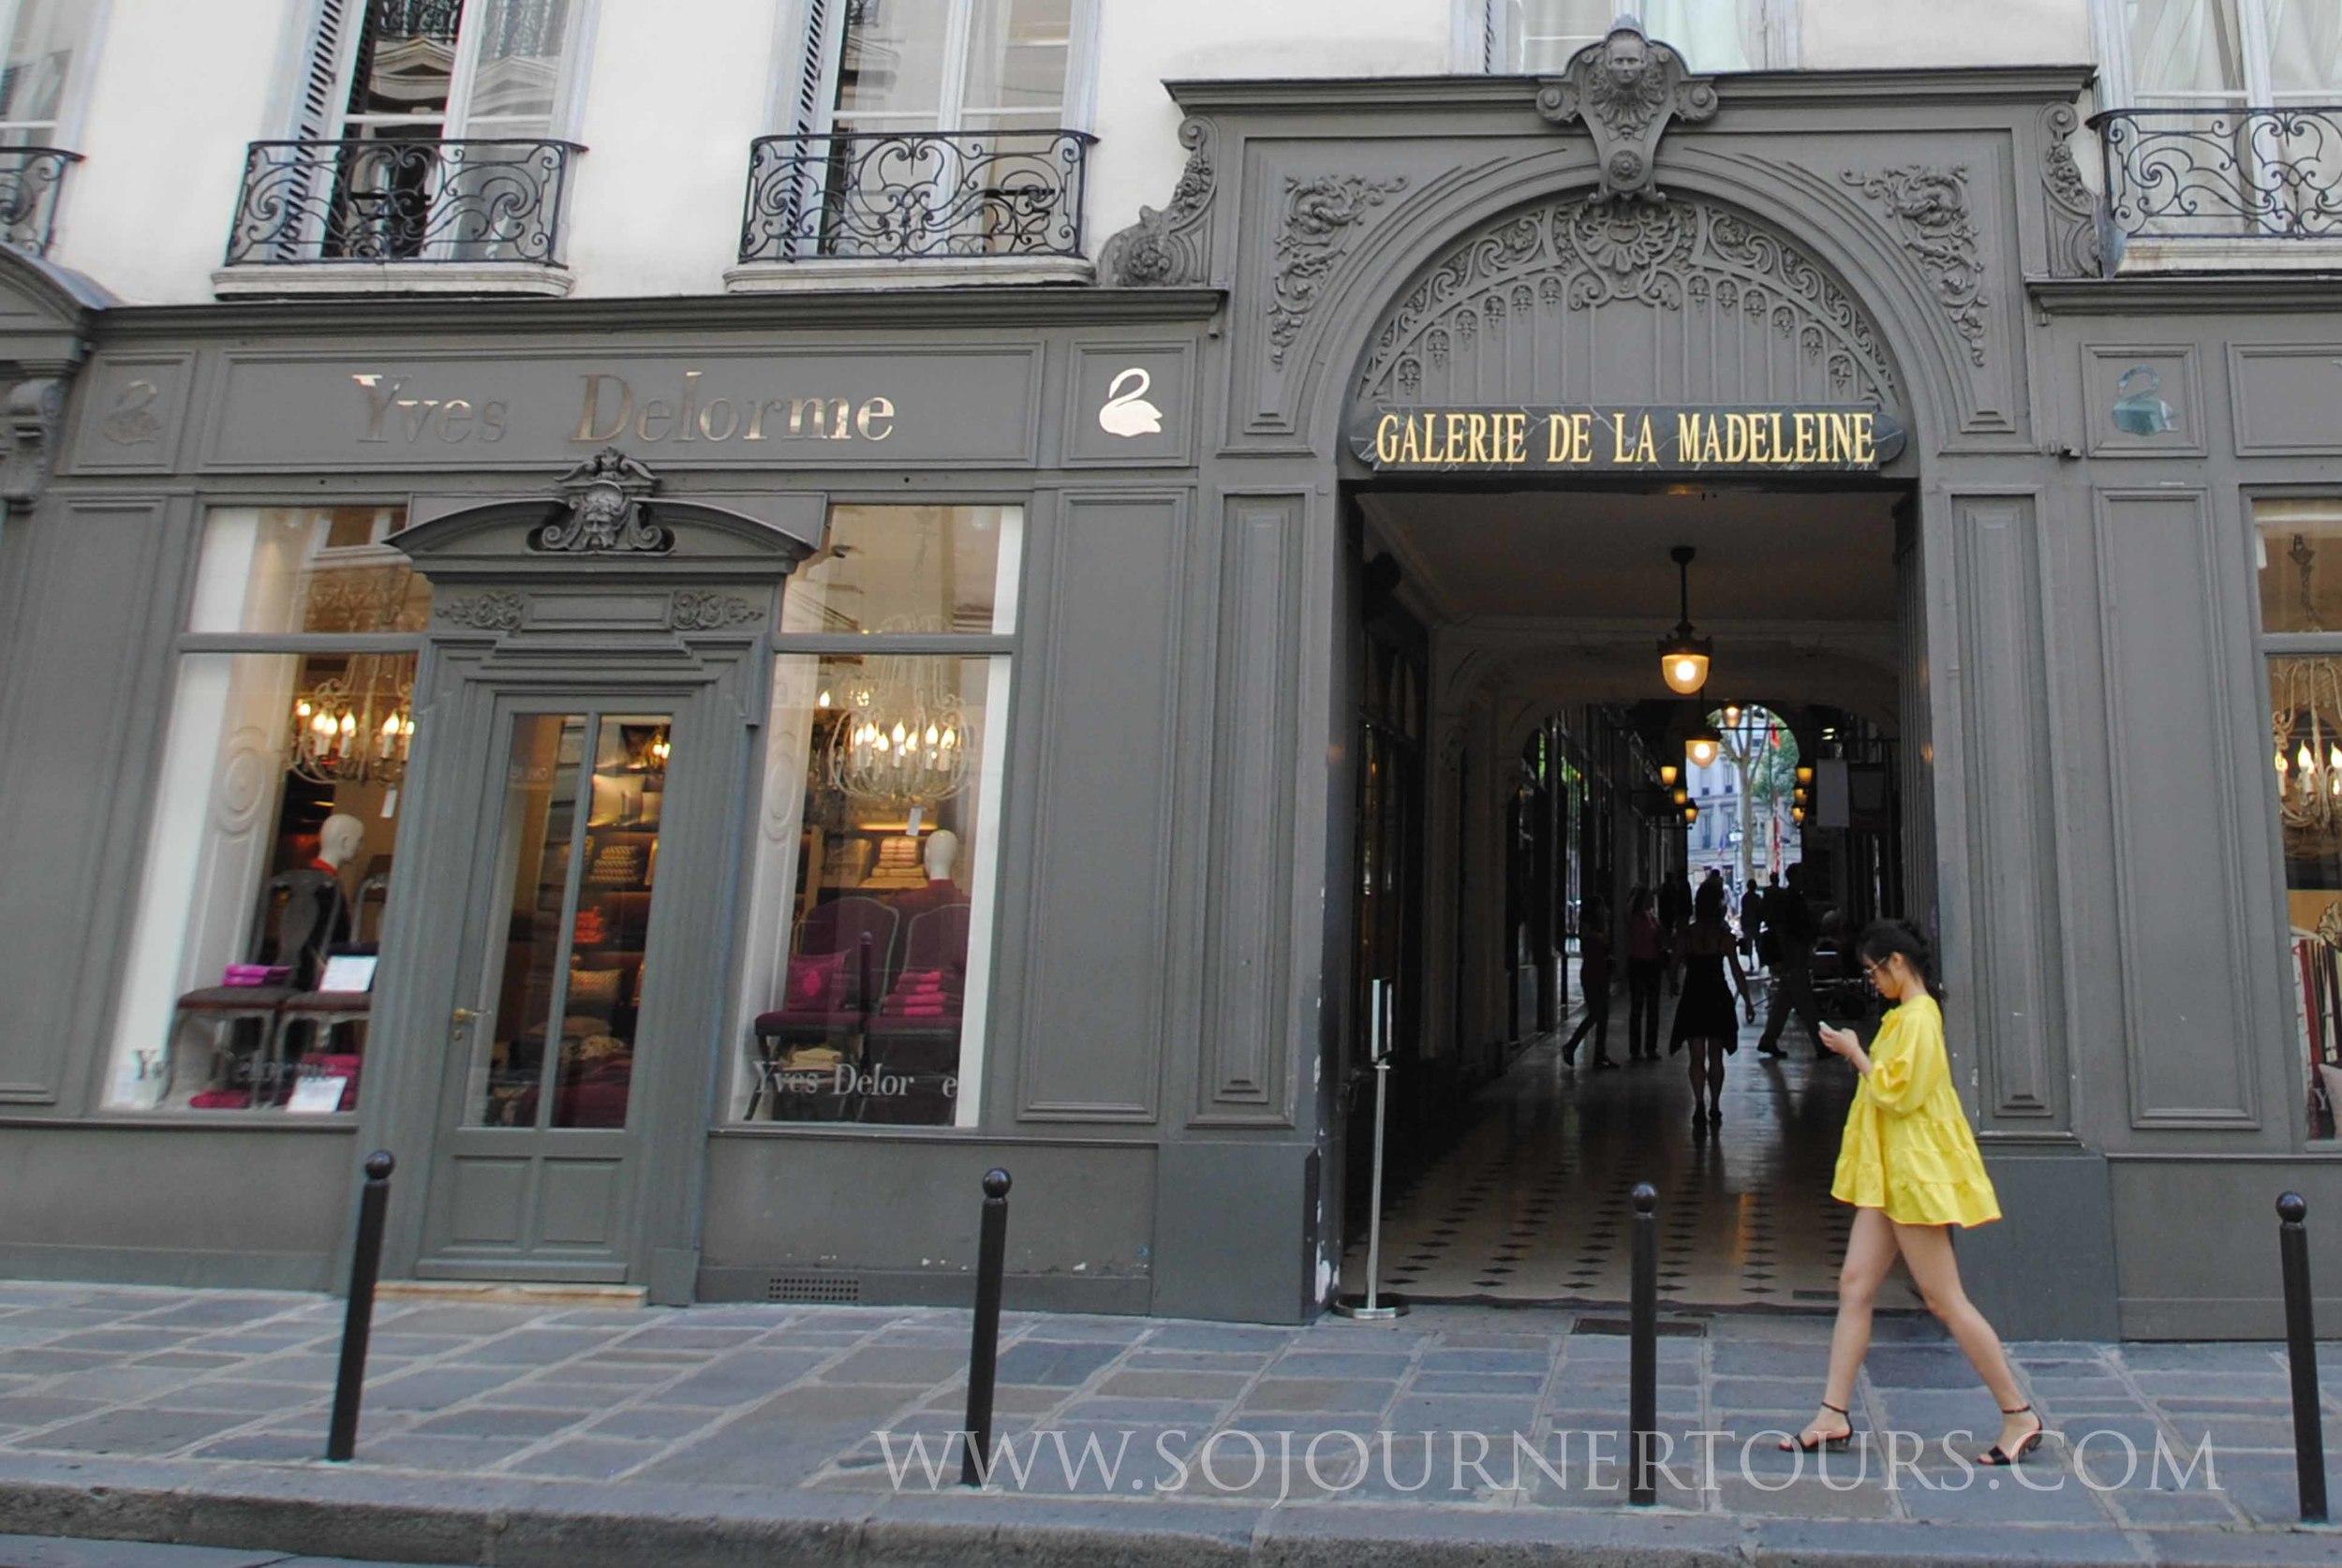 Covered Passage de la Madeleine: Paris, France (Sojourner Tours)